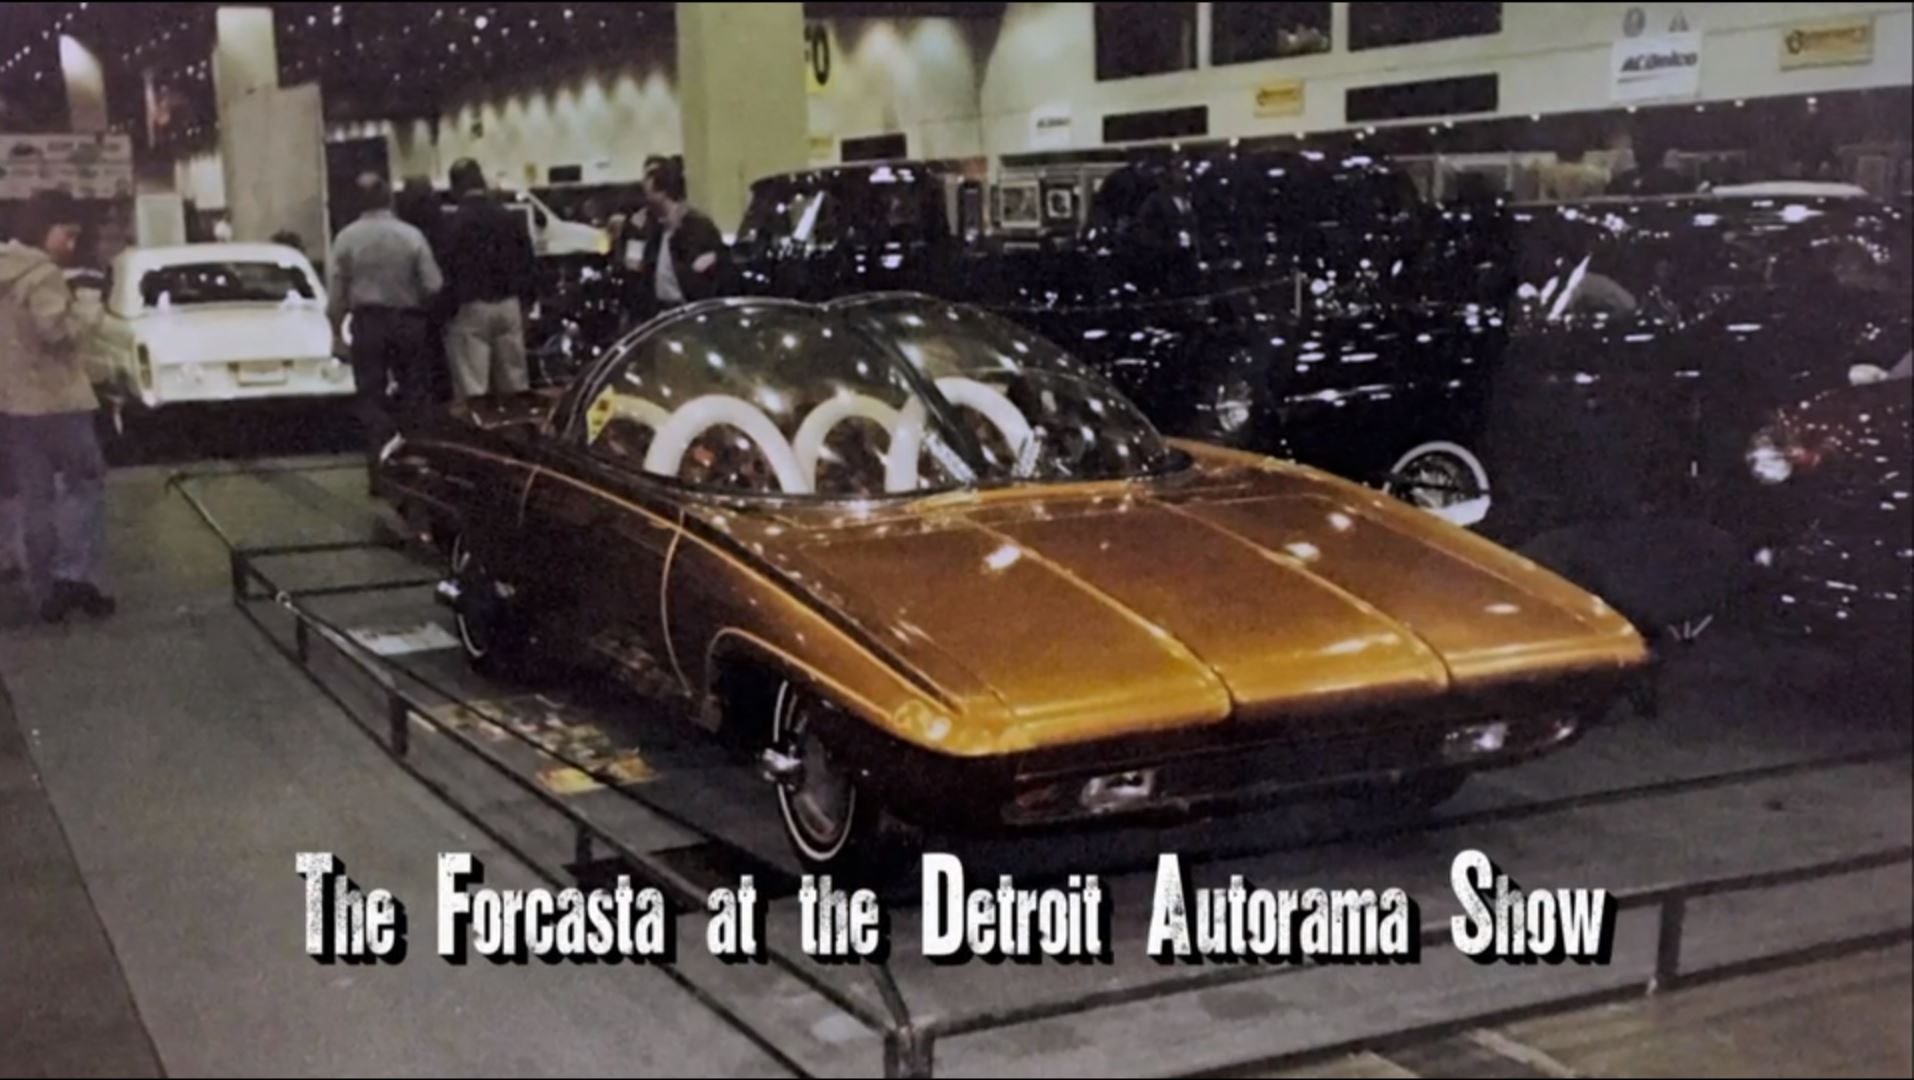 The Forcasta at the Detroit Autorama show